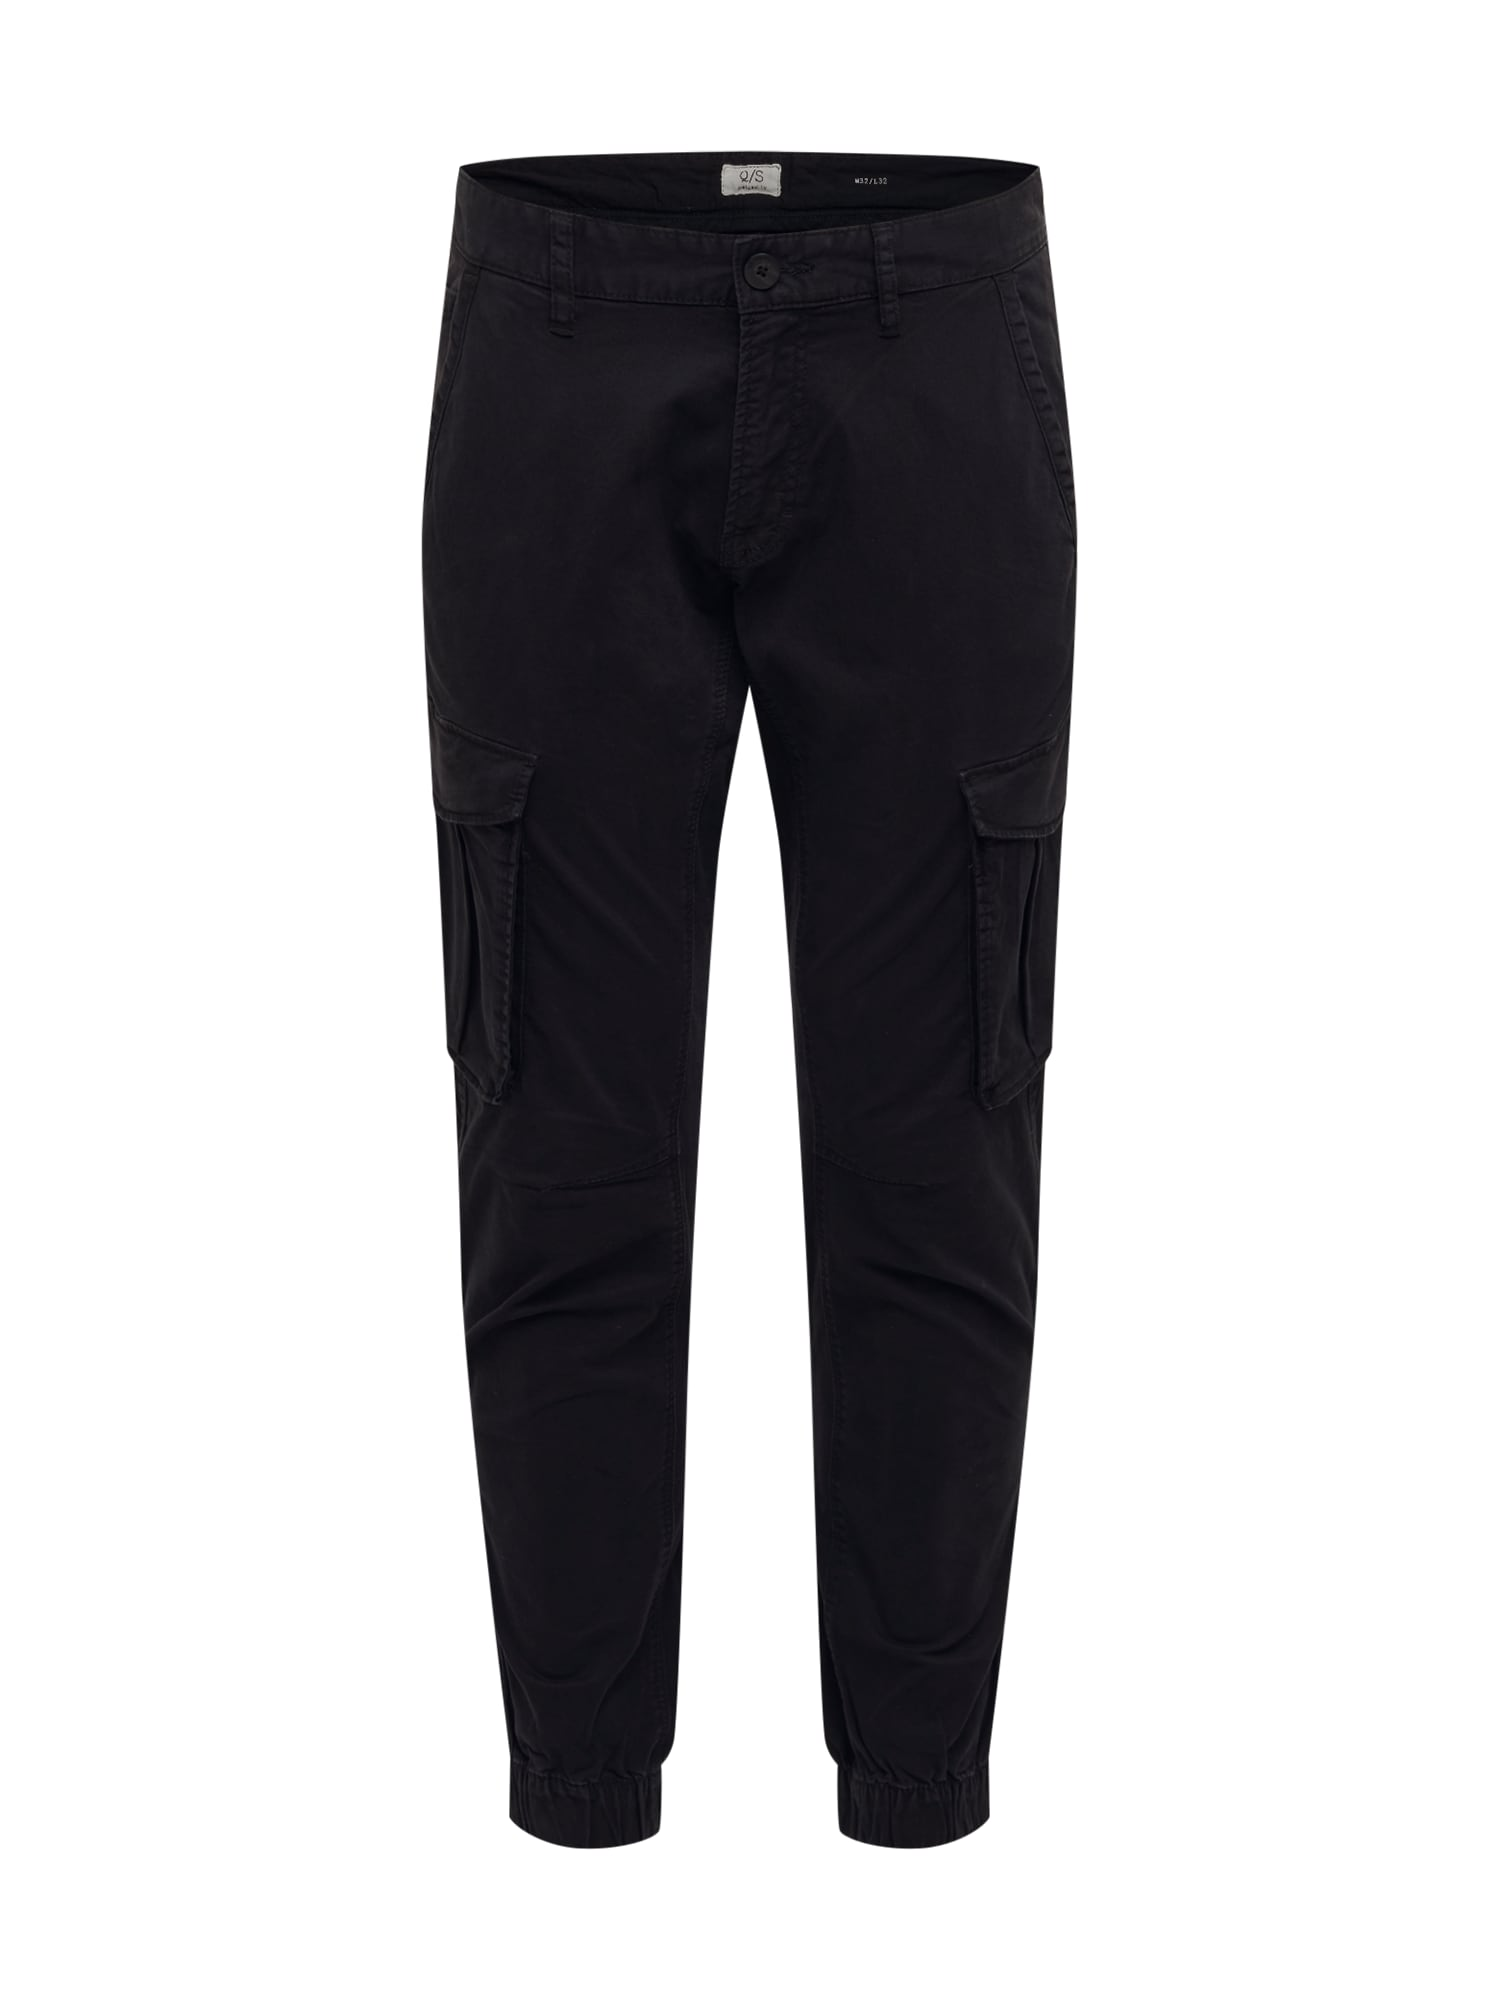 Q/S designed by Laisvo stiliaus kelnės juoda